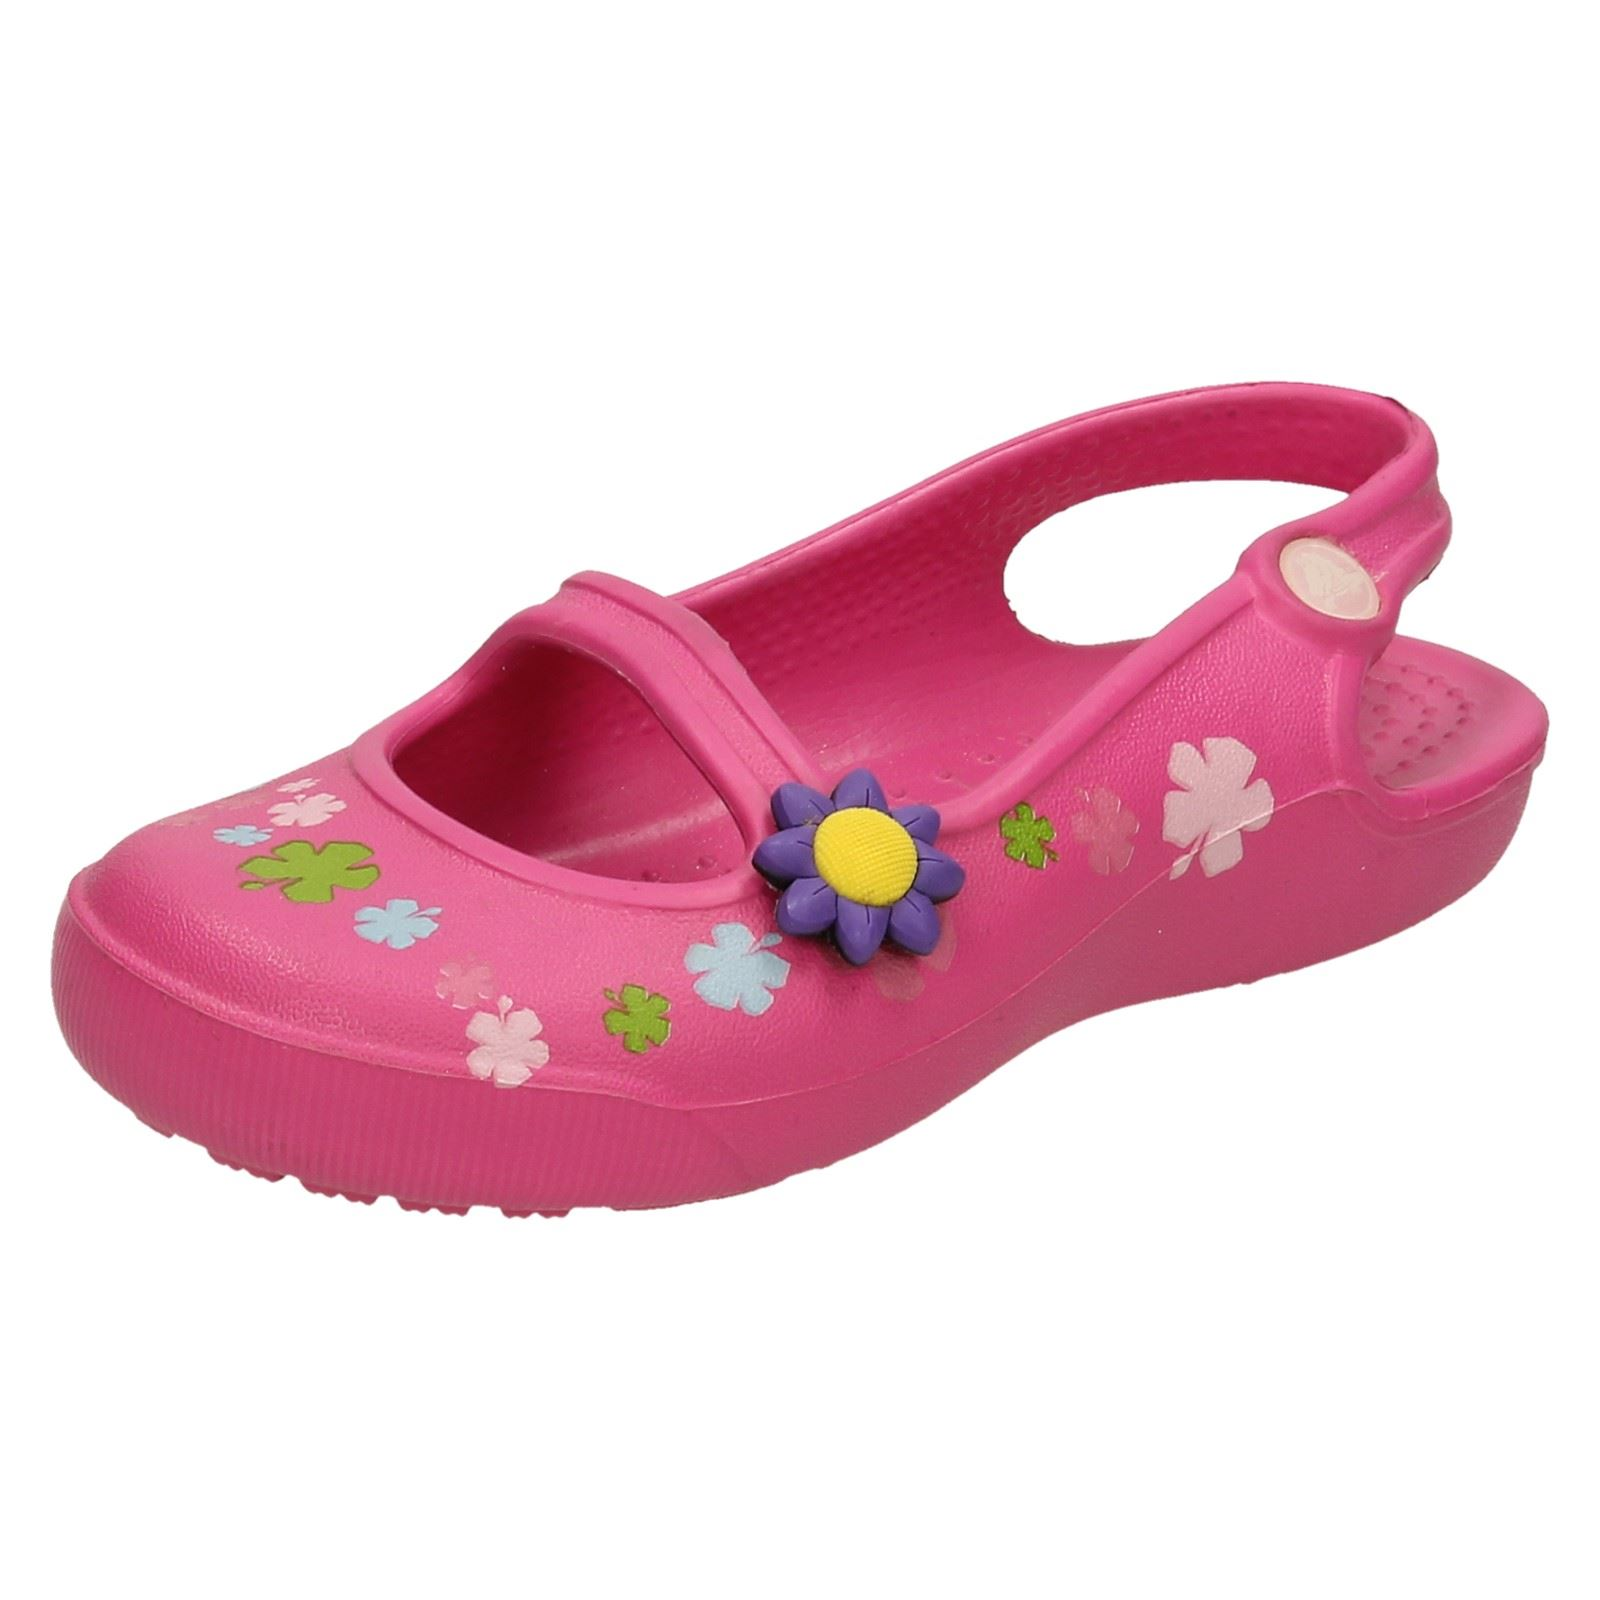 2ab717839d62d Crocs Girls Slip On Sandals - Gabby Flowers